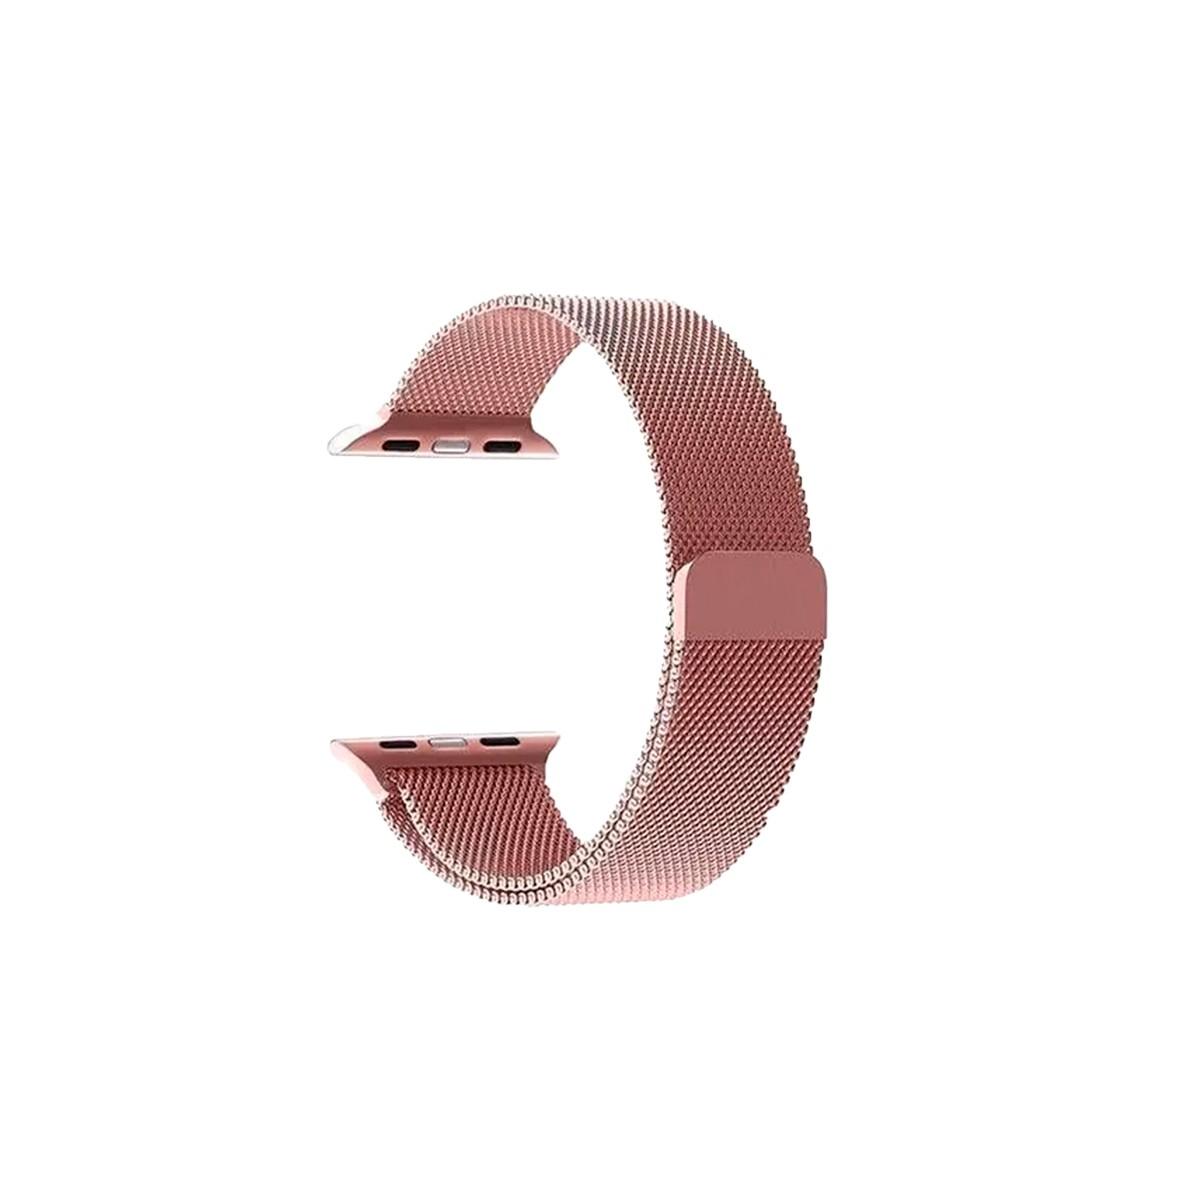 Kit com 2 Pulseira para Apple Watch - Metal e Milanês